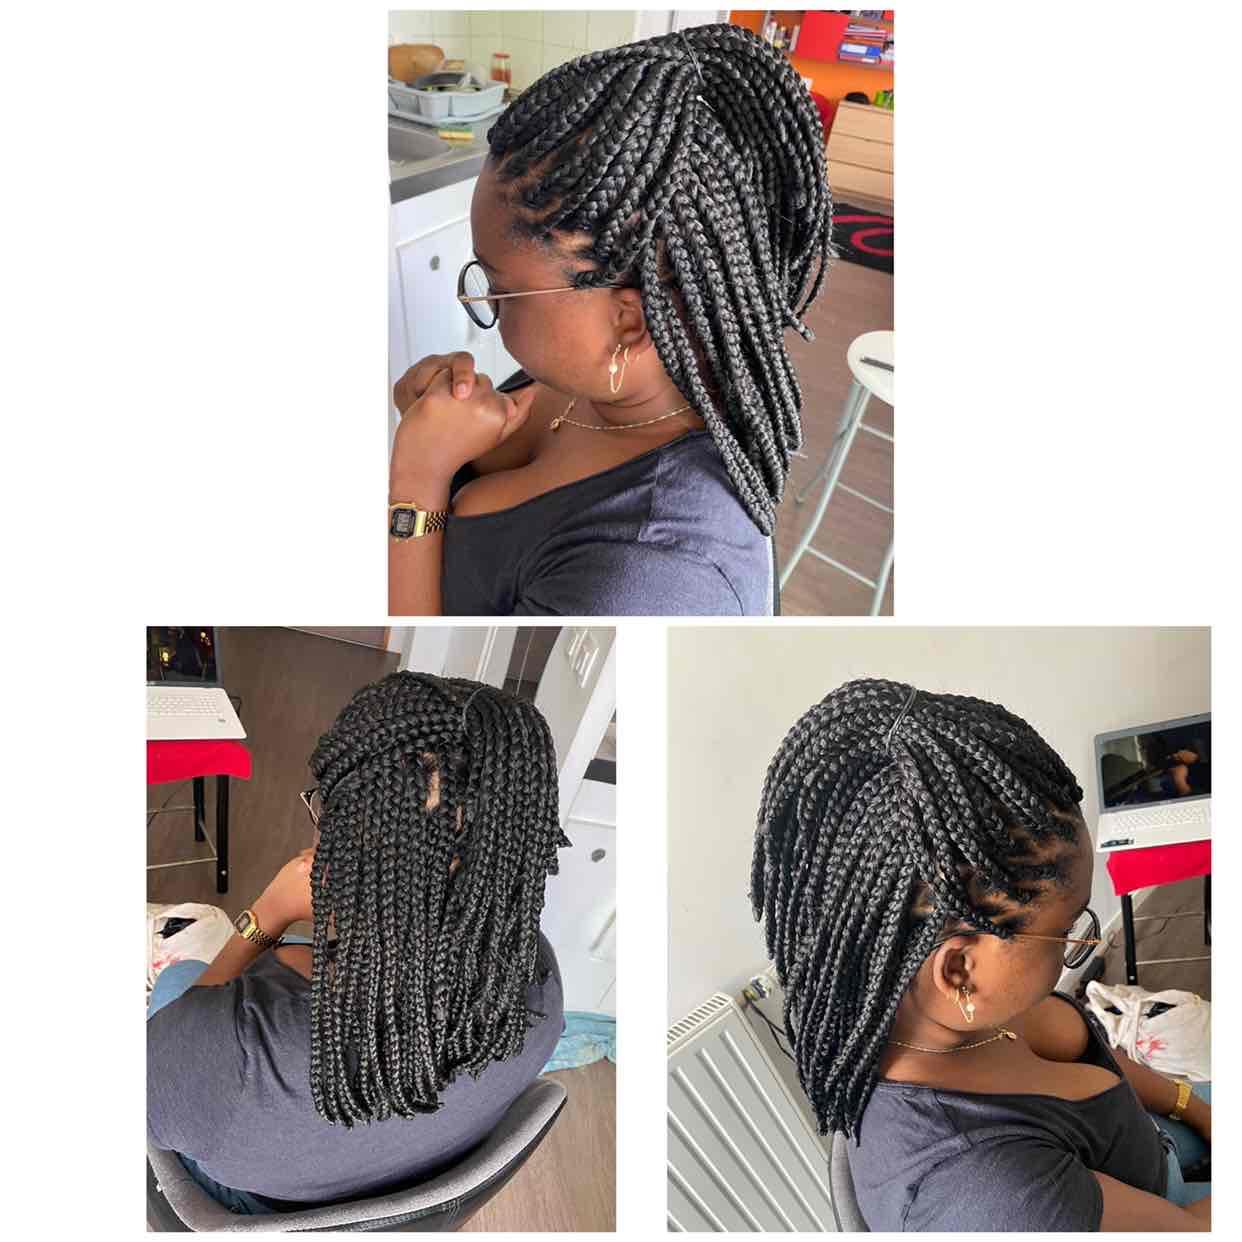 salon de coiffure afro tresse tresses box braids crochet braids vanilles tissages paris 75 77 78 91 92 93 94 95 VMOALBSJ